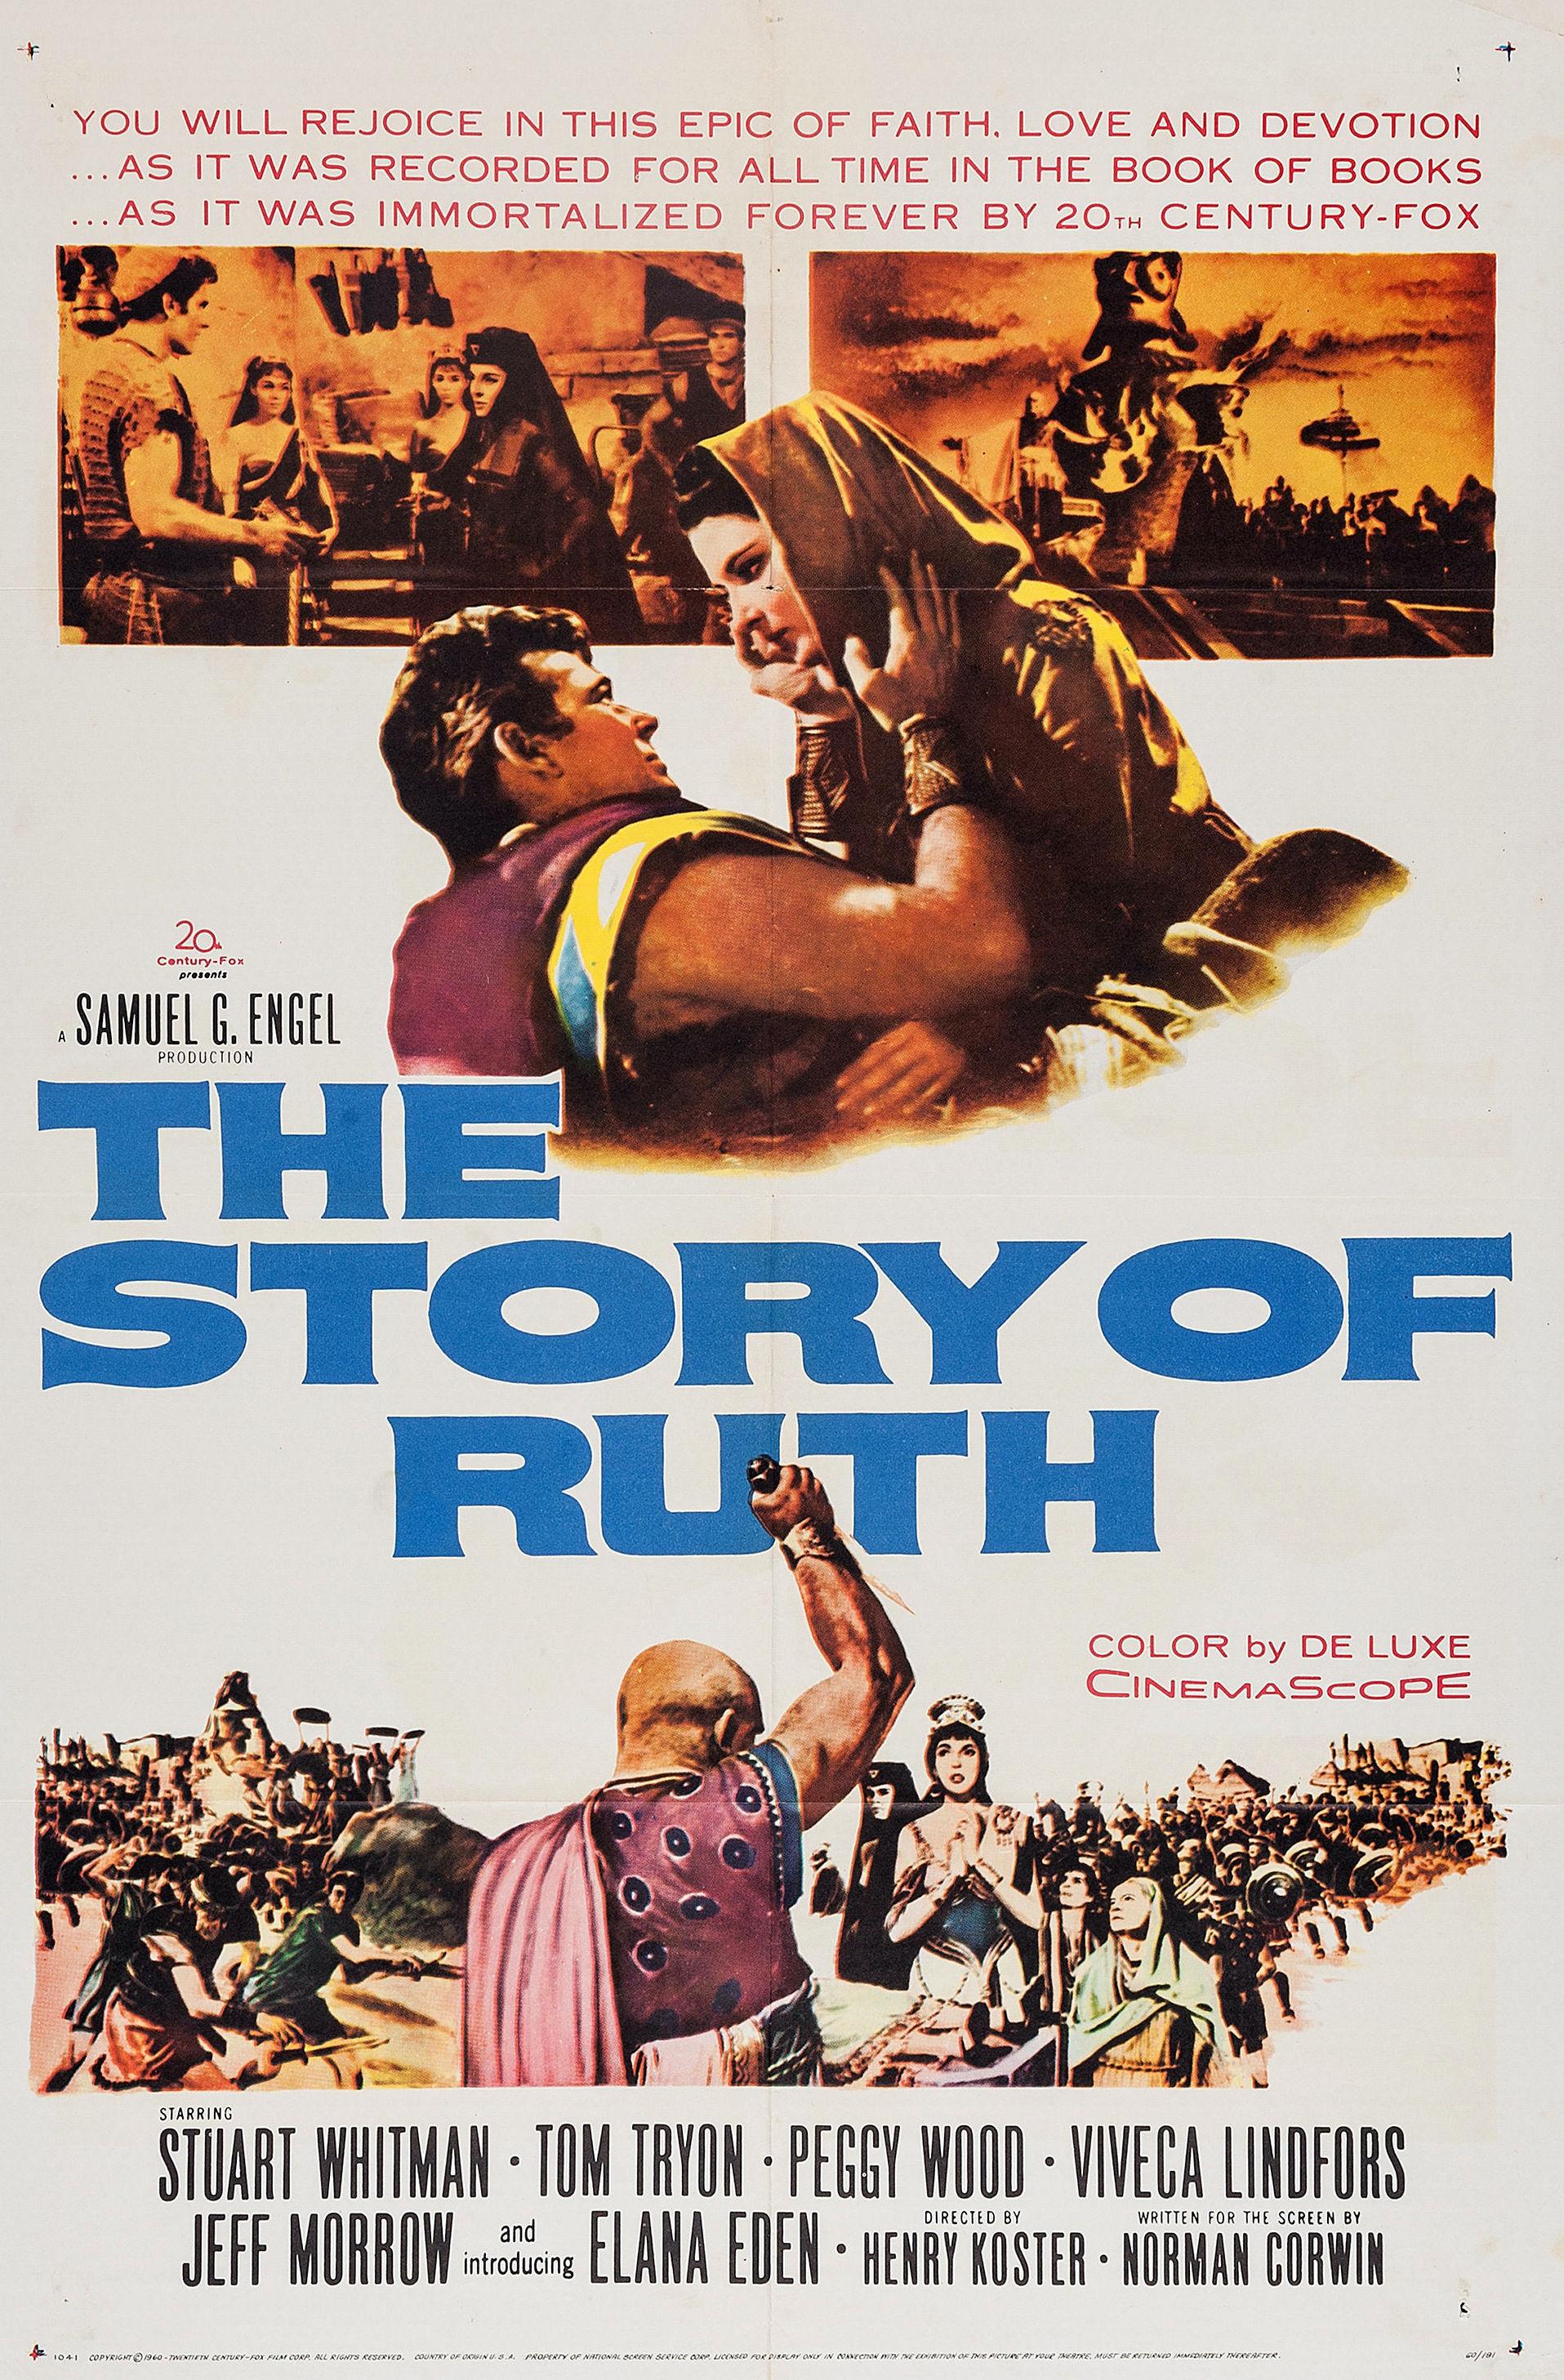 A História de Ruth [Dub] – IMDB 6.8